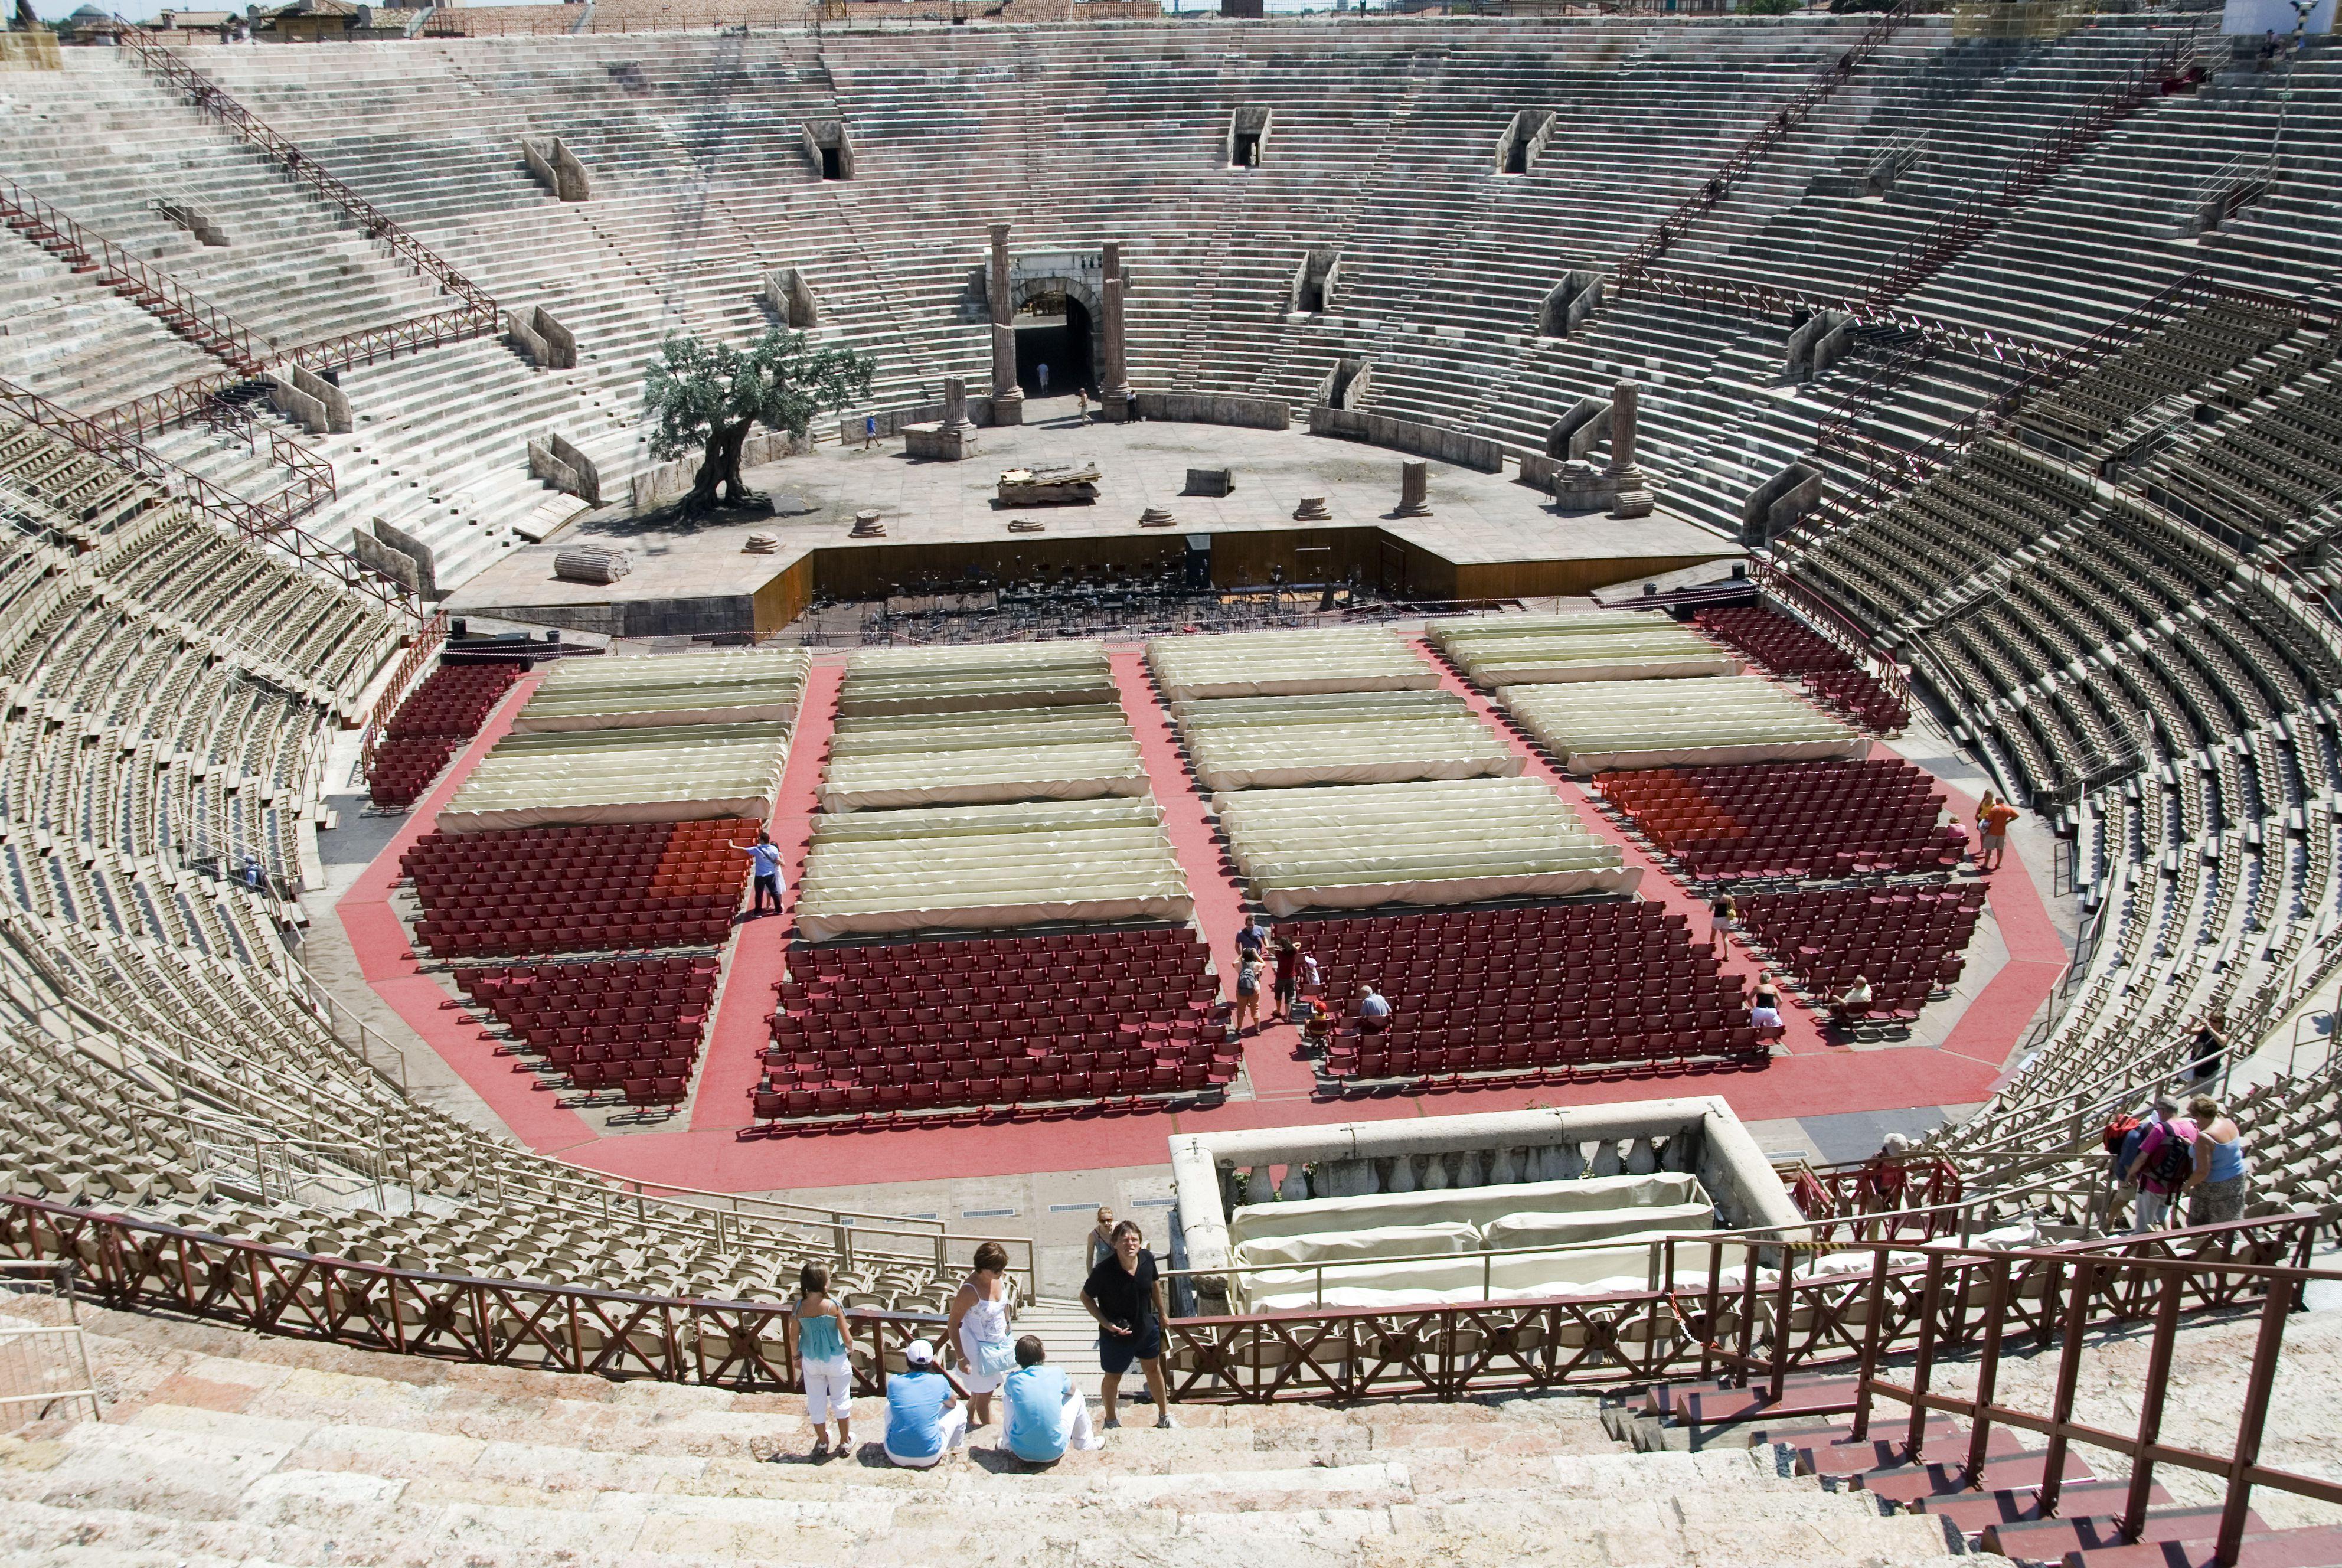 Overhead of 1st-century Roman arena.